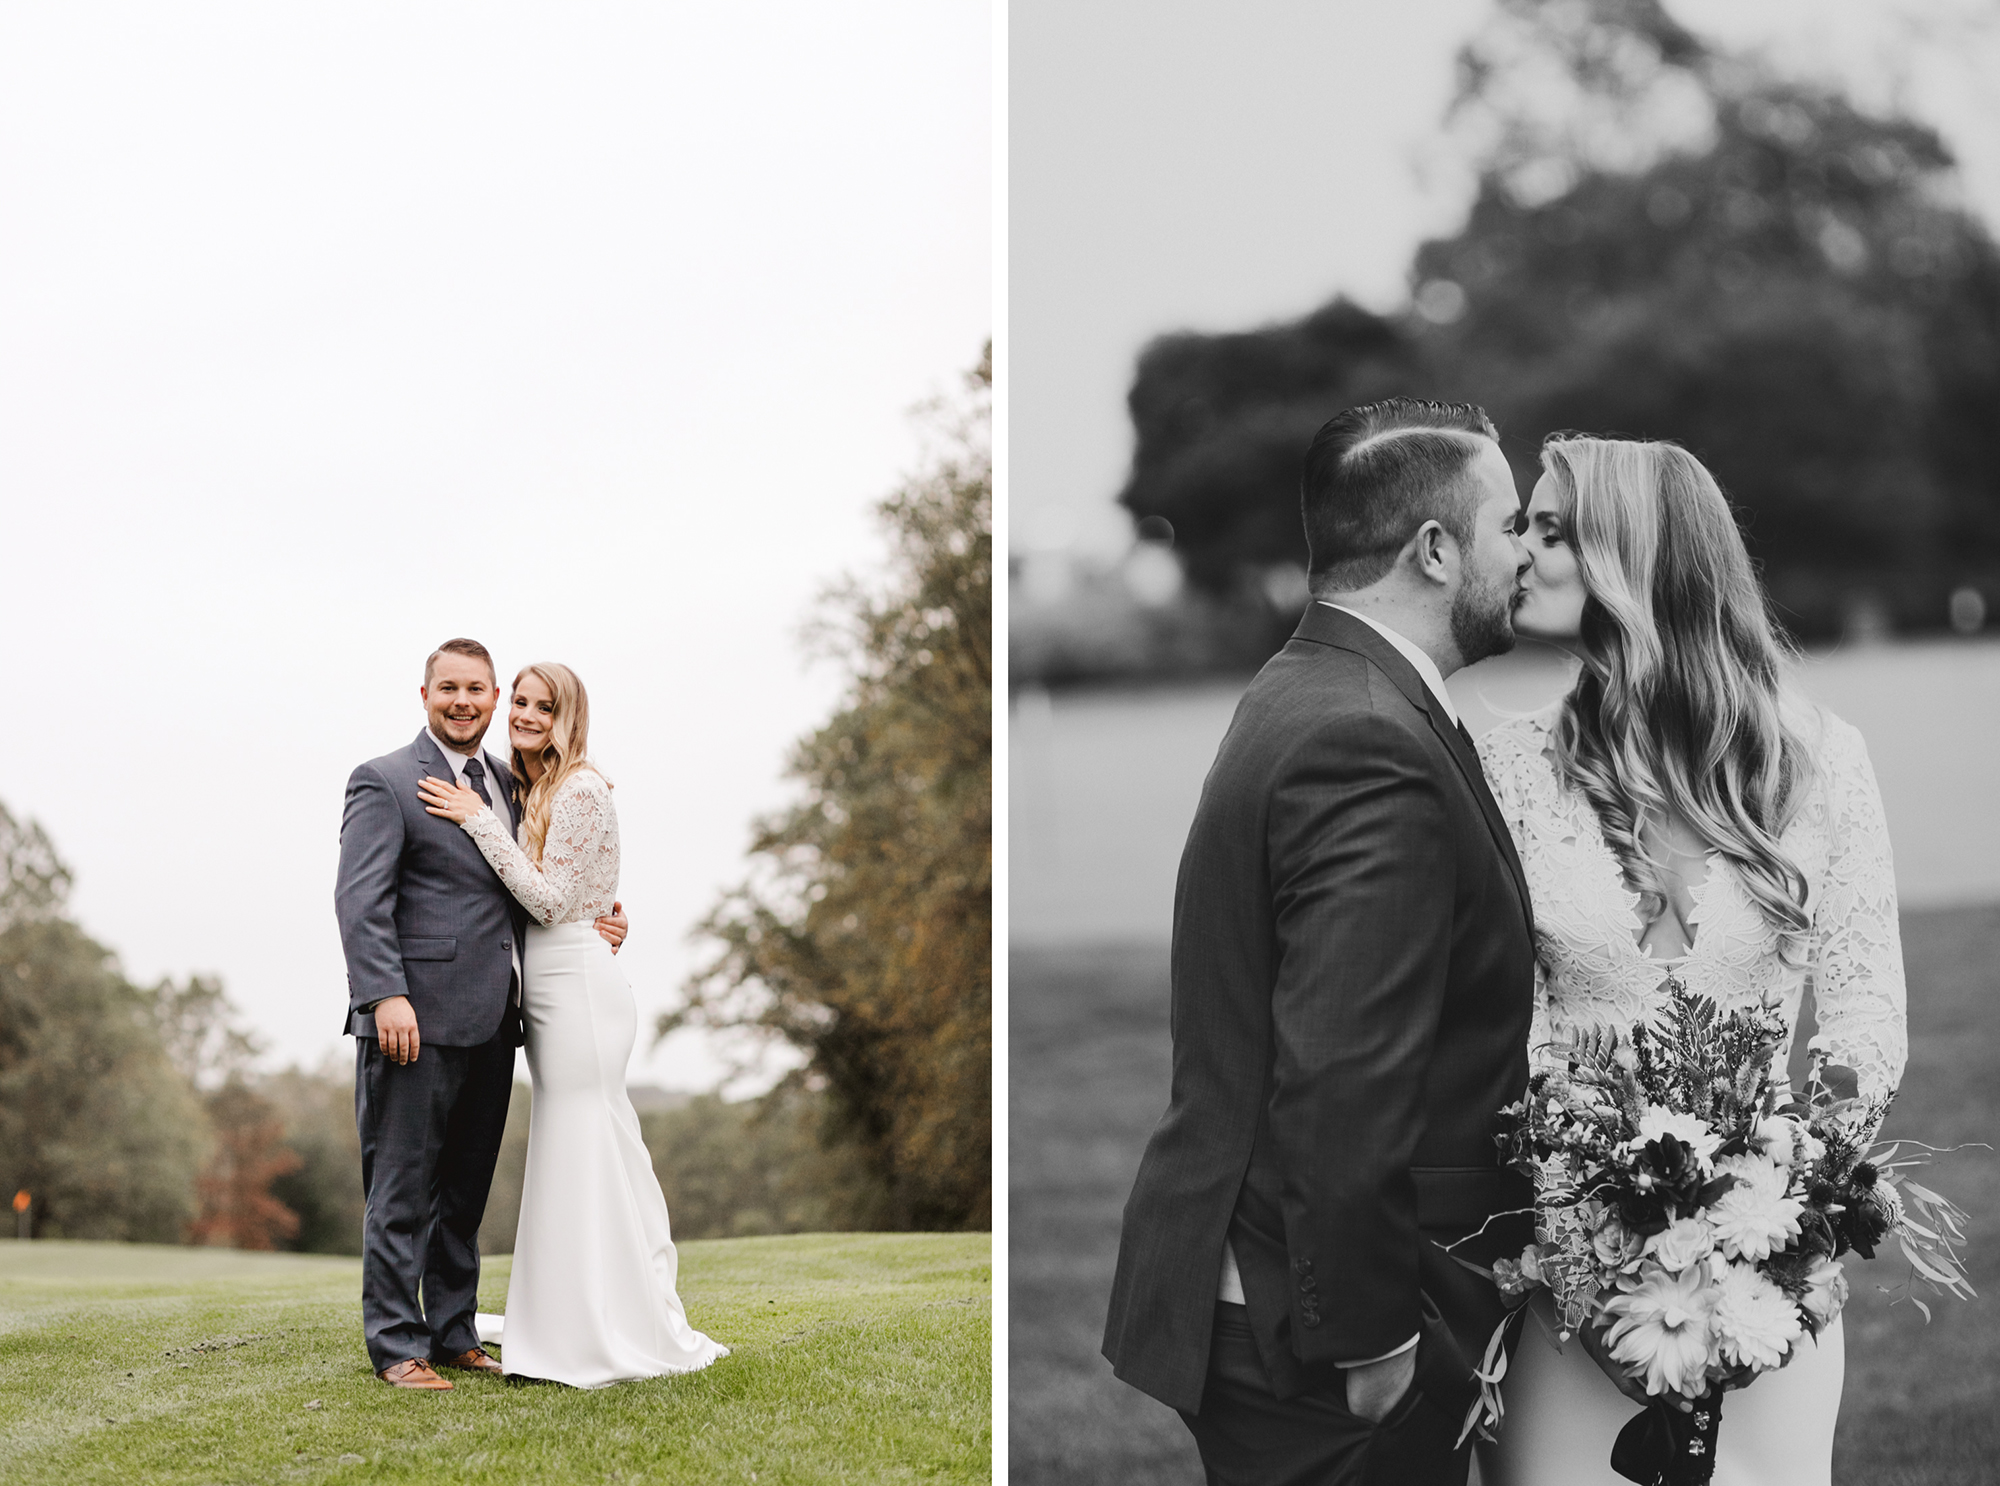 Deerfield-Country-Club-Wedding-DE-Delaware-Peaberry-Photography-PA-NJ-Wedding-Photographer-77.jpg